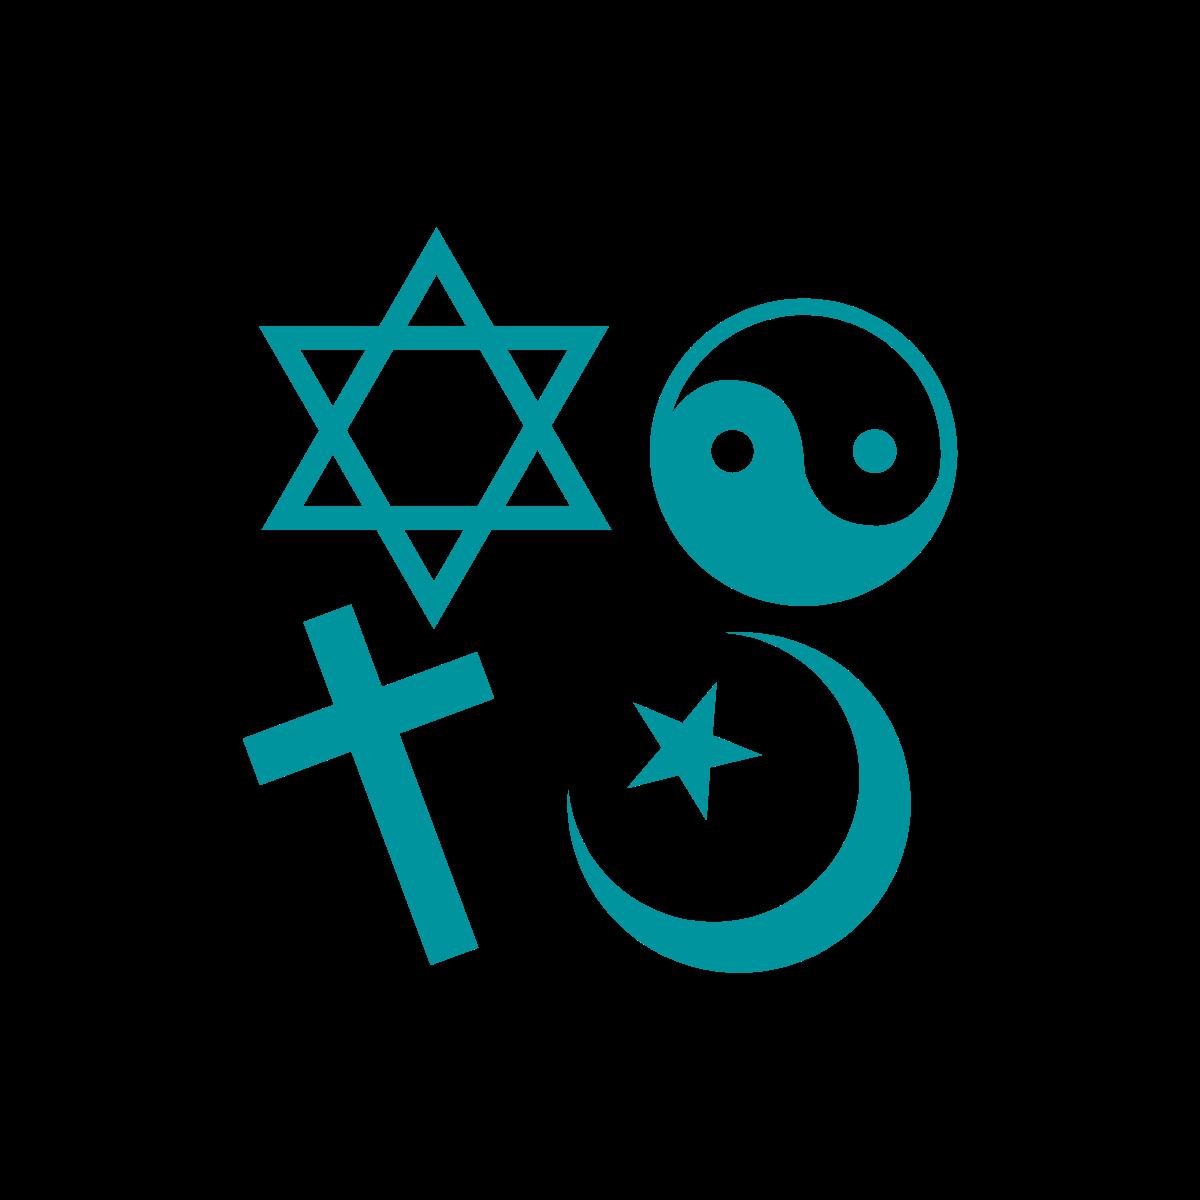 Icon of religious symbols